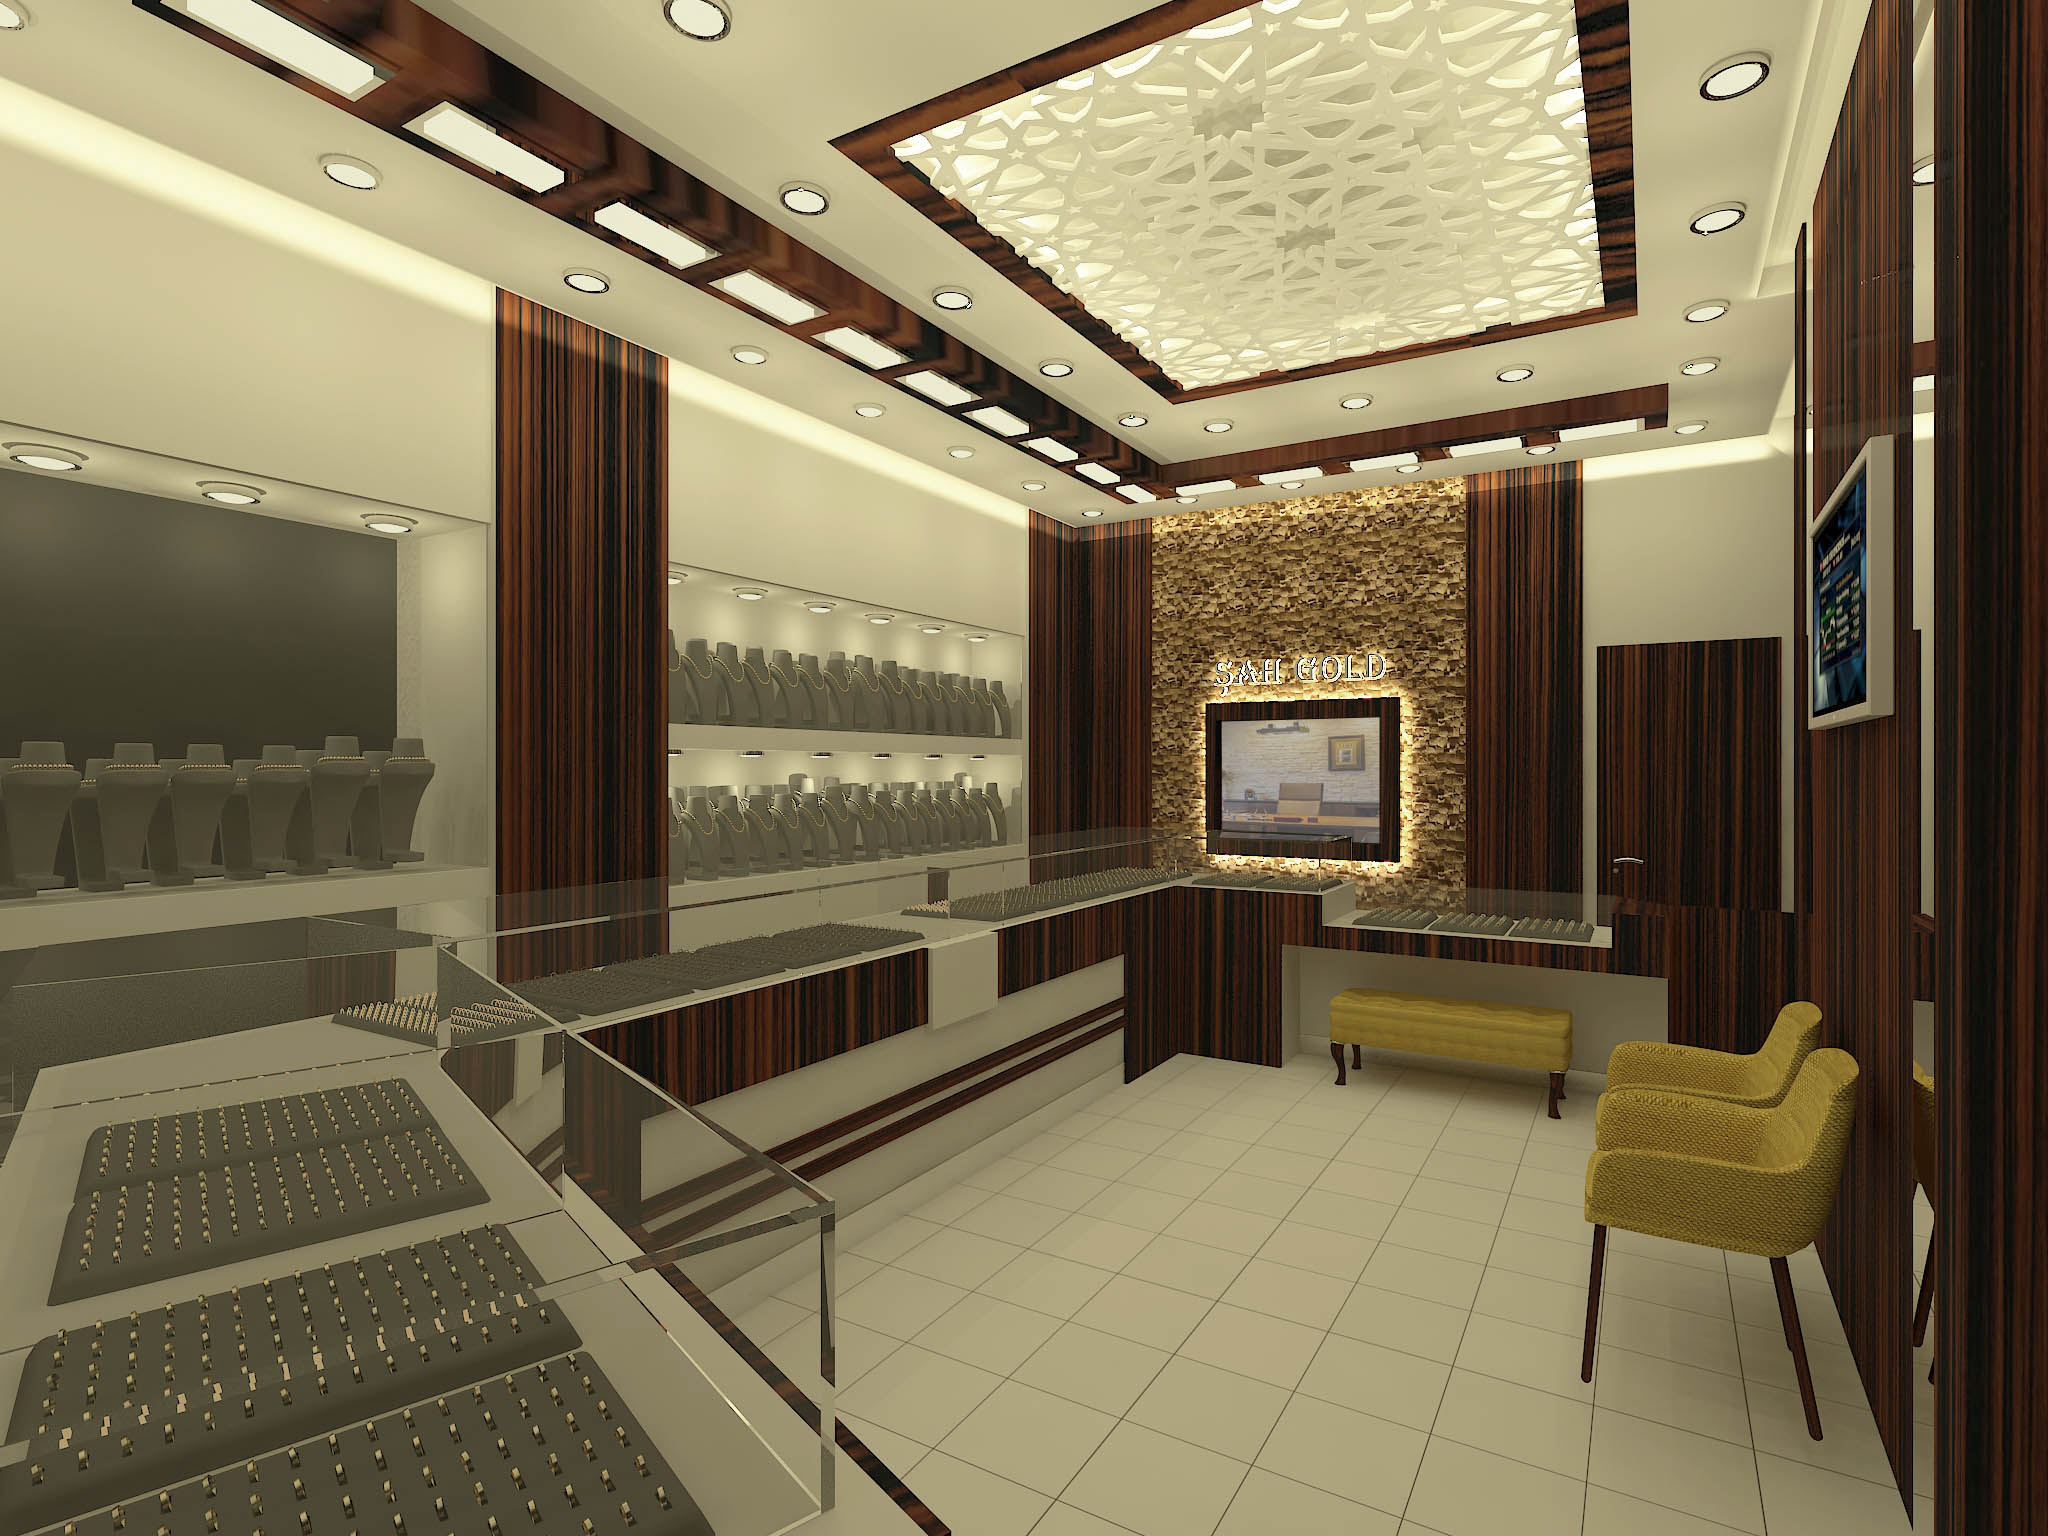 Şahgold Kuyumculuk,  Kuyumcu mağaza tasarımları (3)